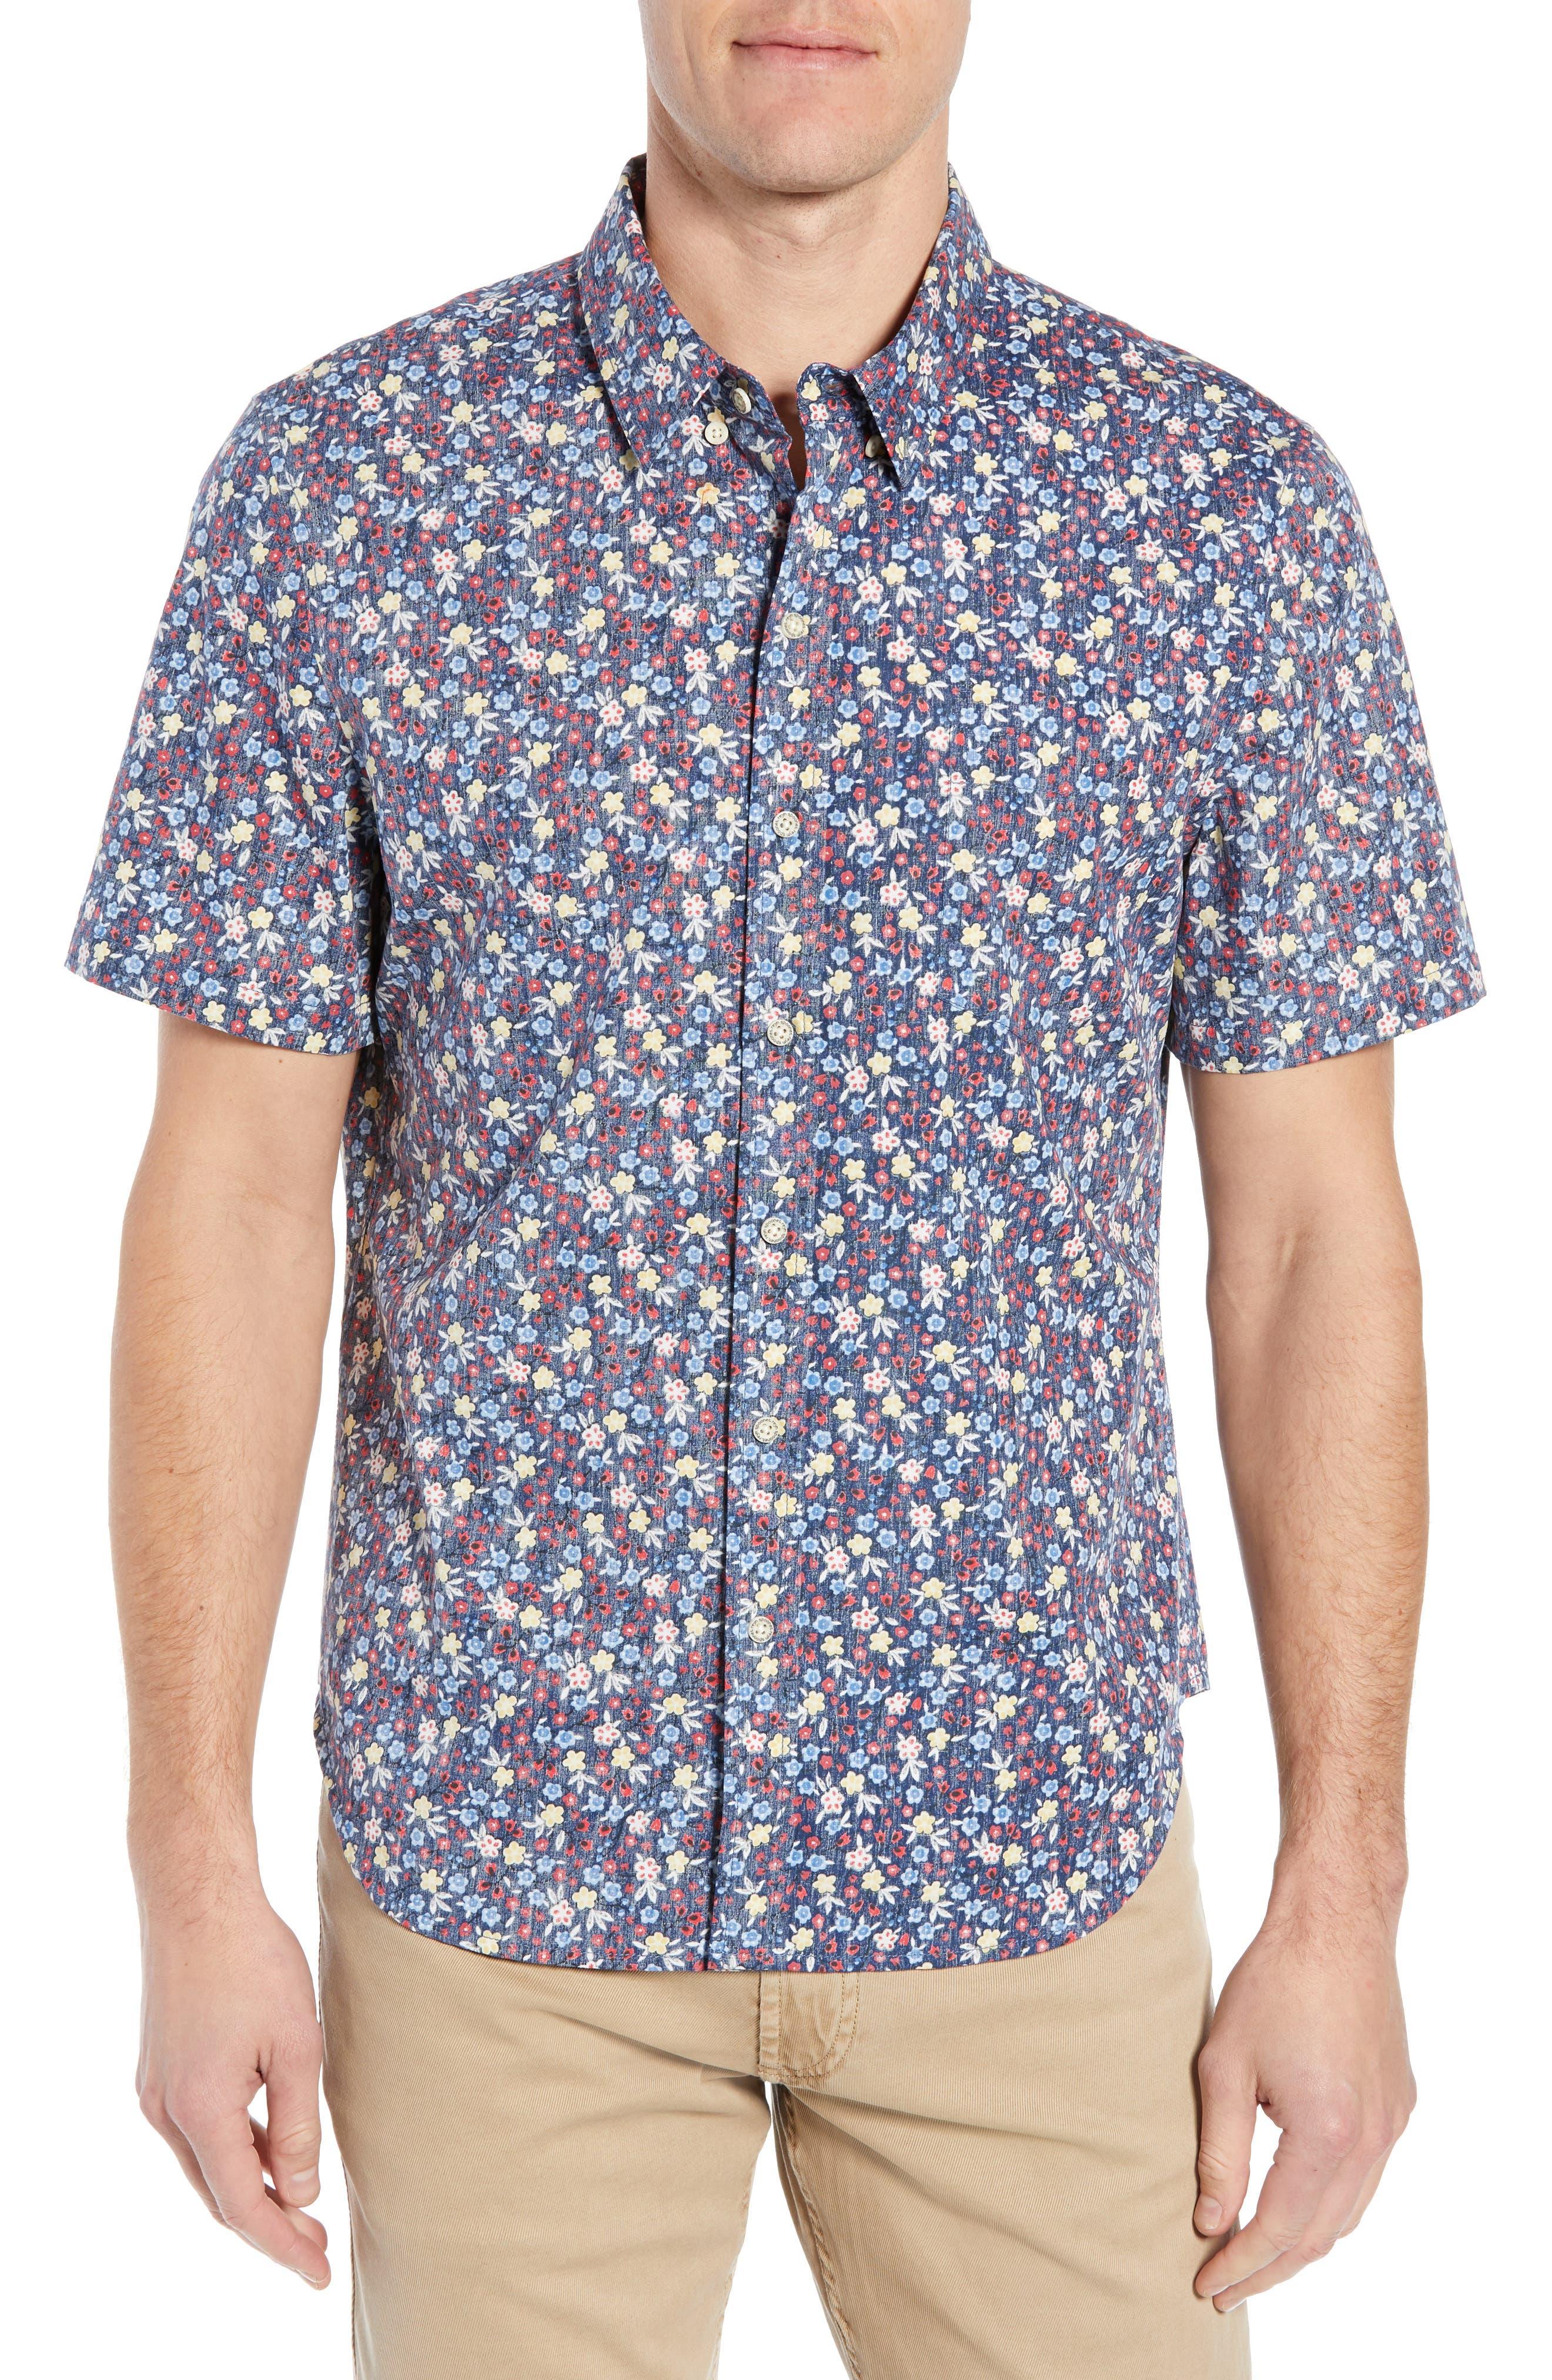 REYN SPOONER, Retro Tailored Fit Sport Shirt, Main thumbnail 1, color, MEDIEVAL BLUE